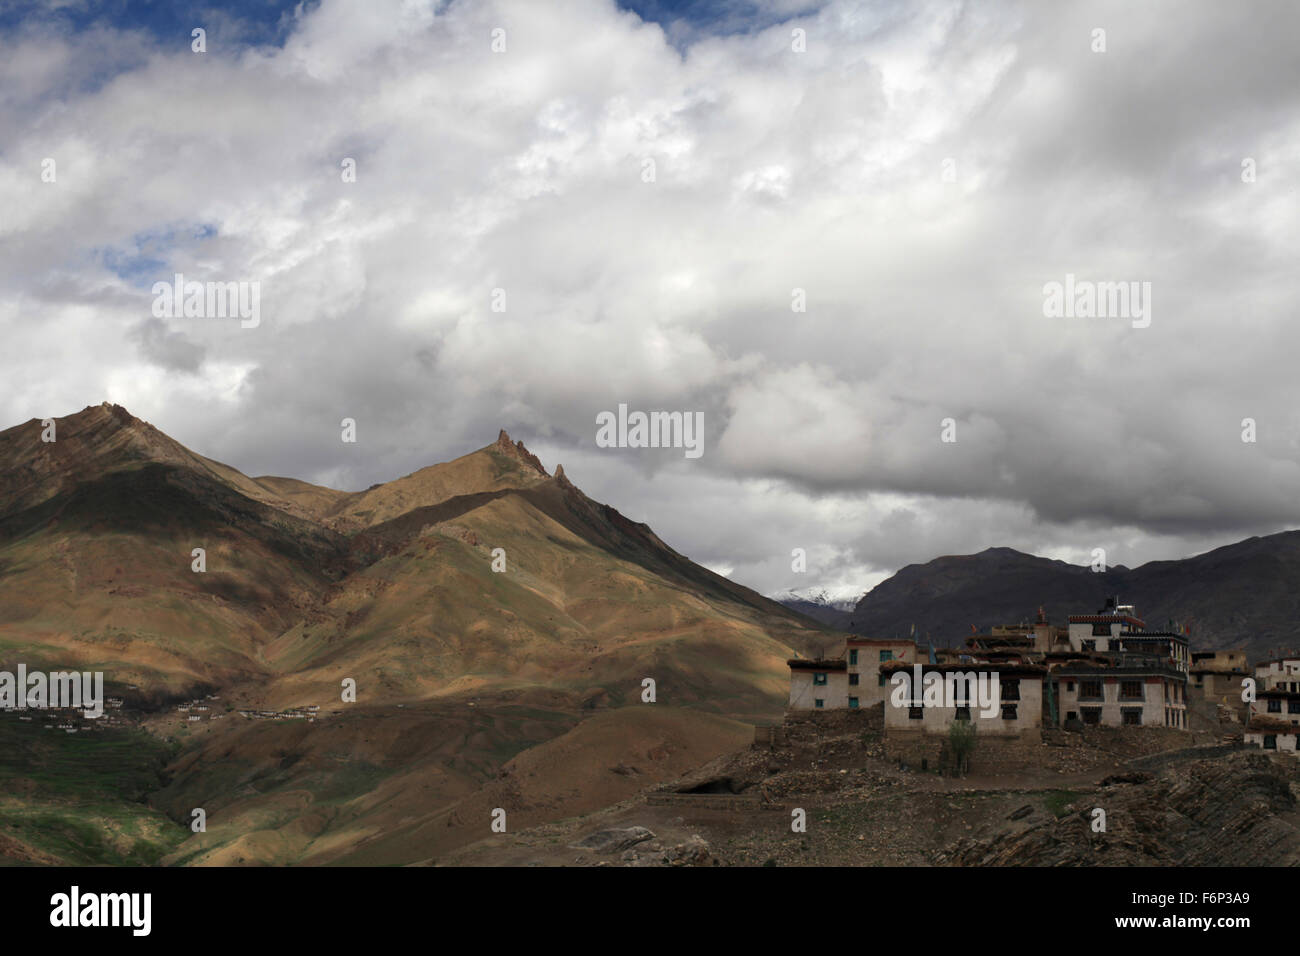 SPITI VALLEY - Rangarik Village, Himachal Pradesh, India Stock Photo